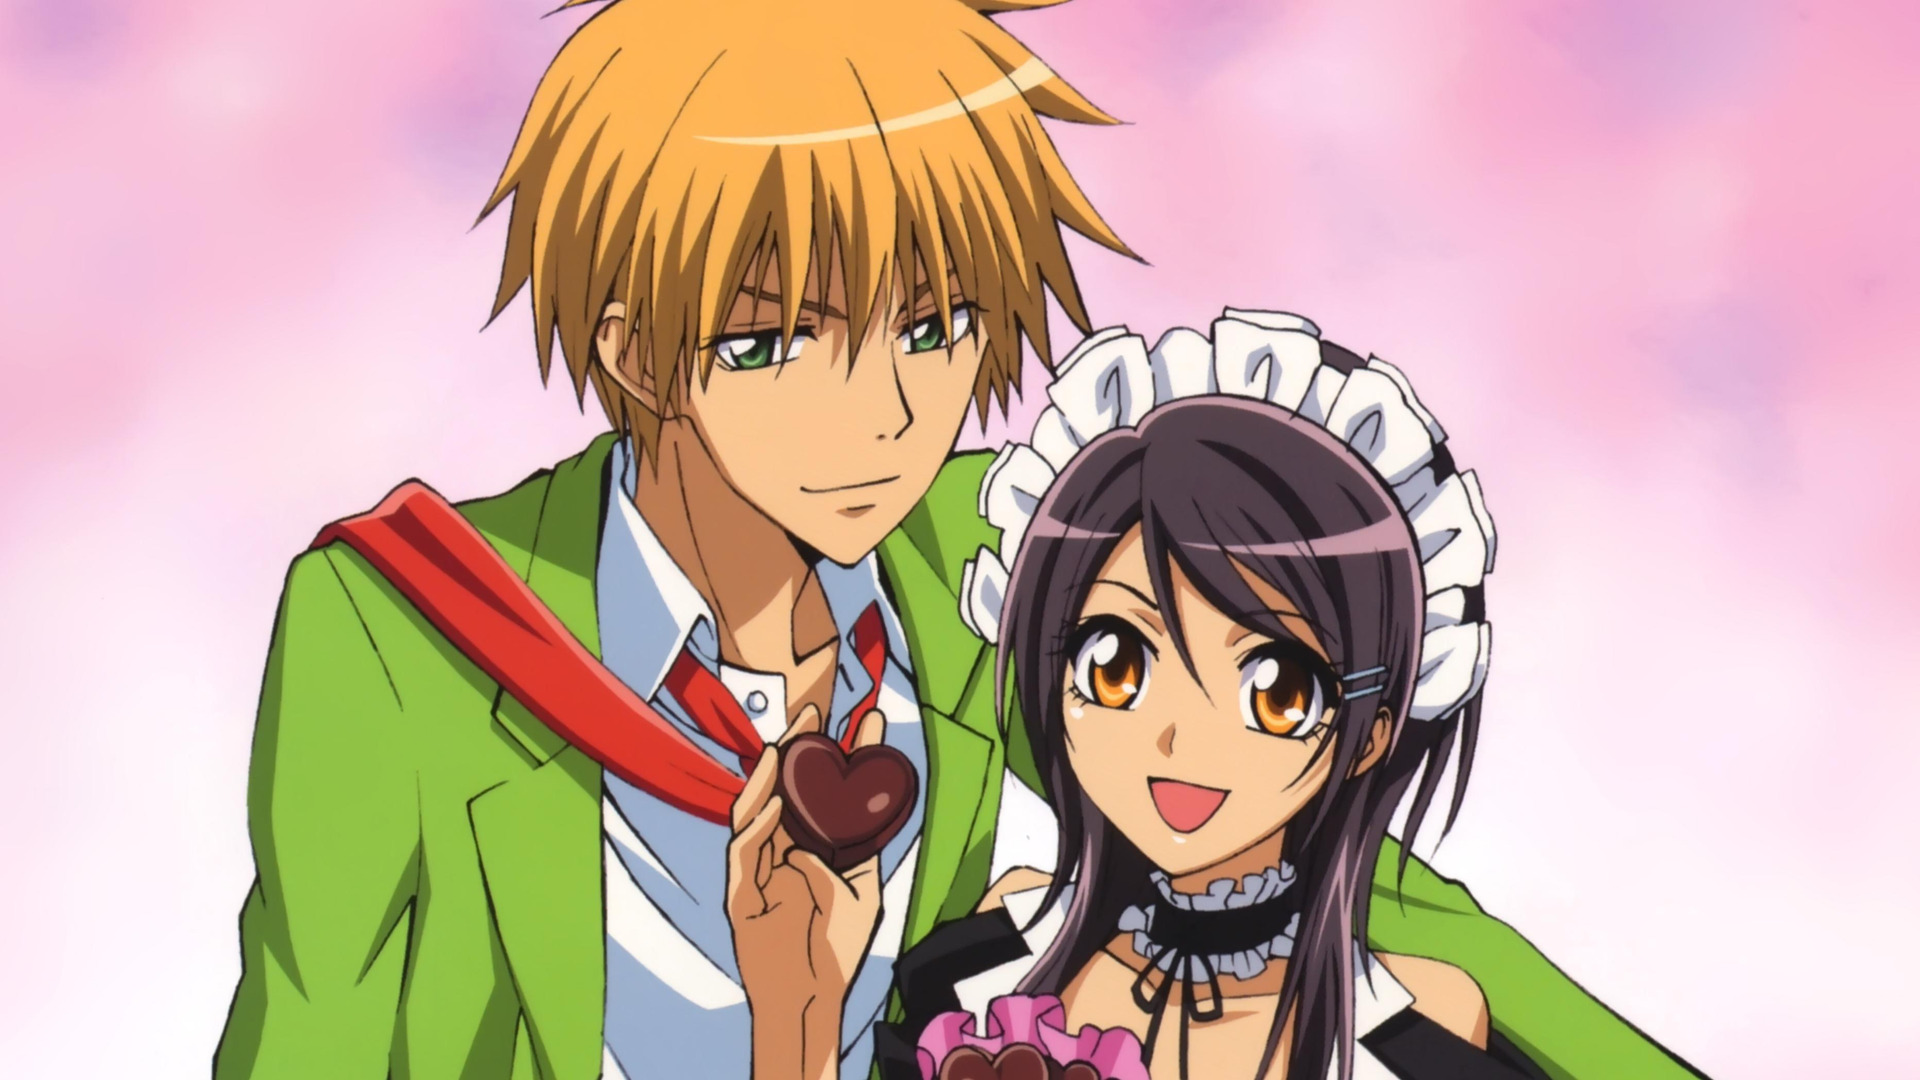 Anime Kaichou wa Maid-sama!